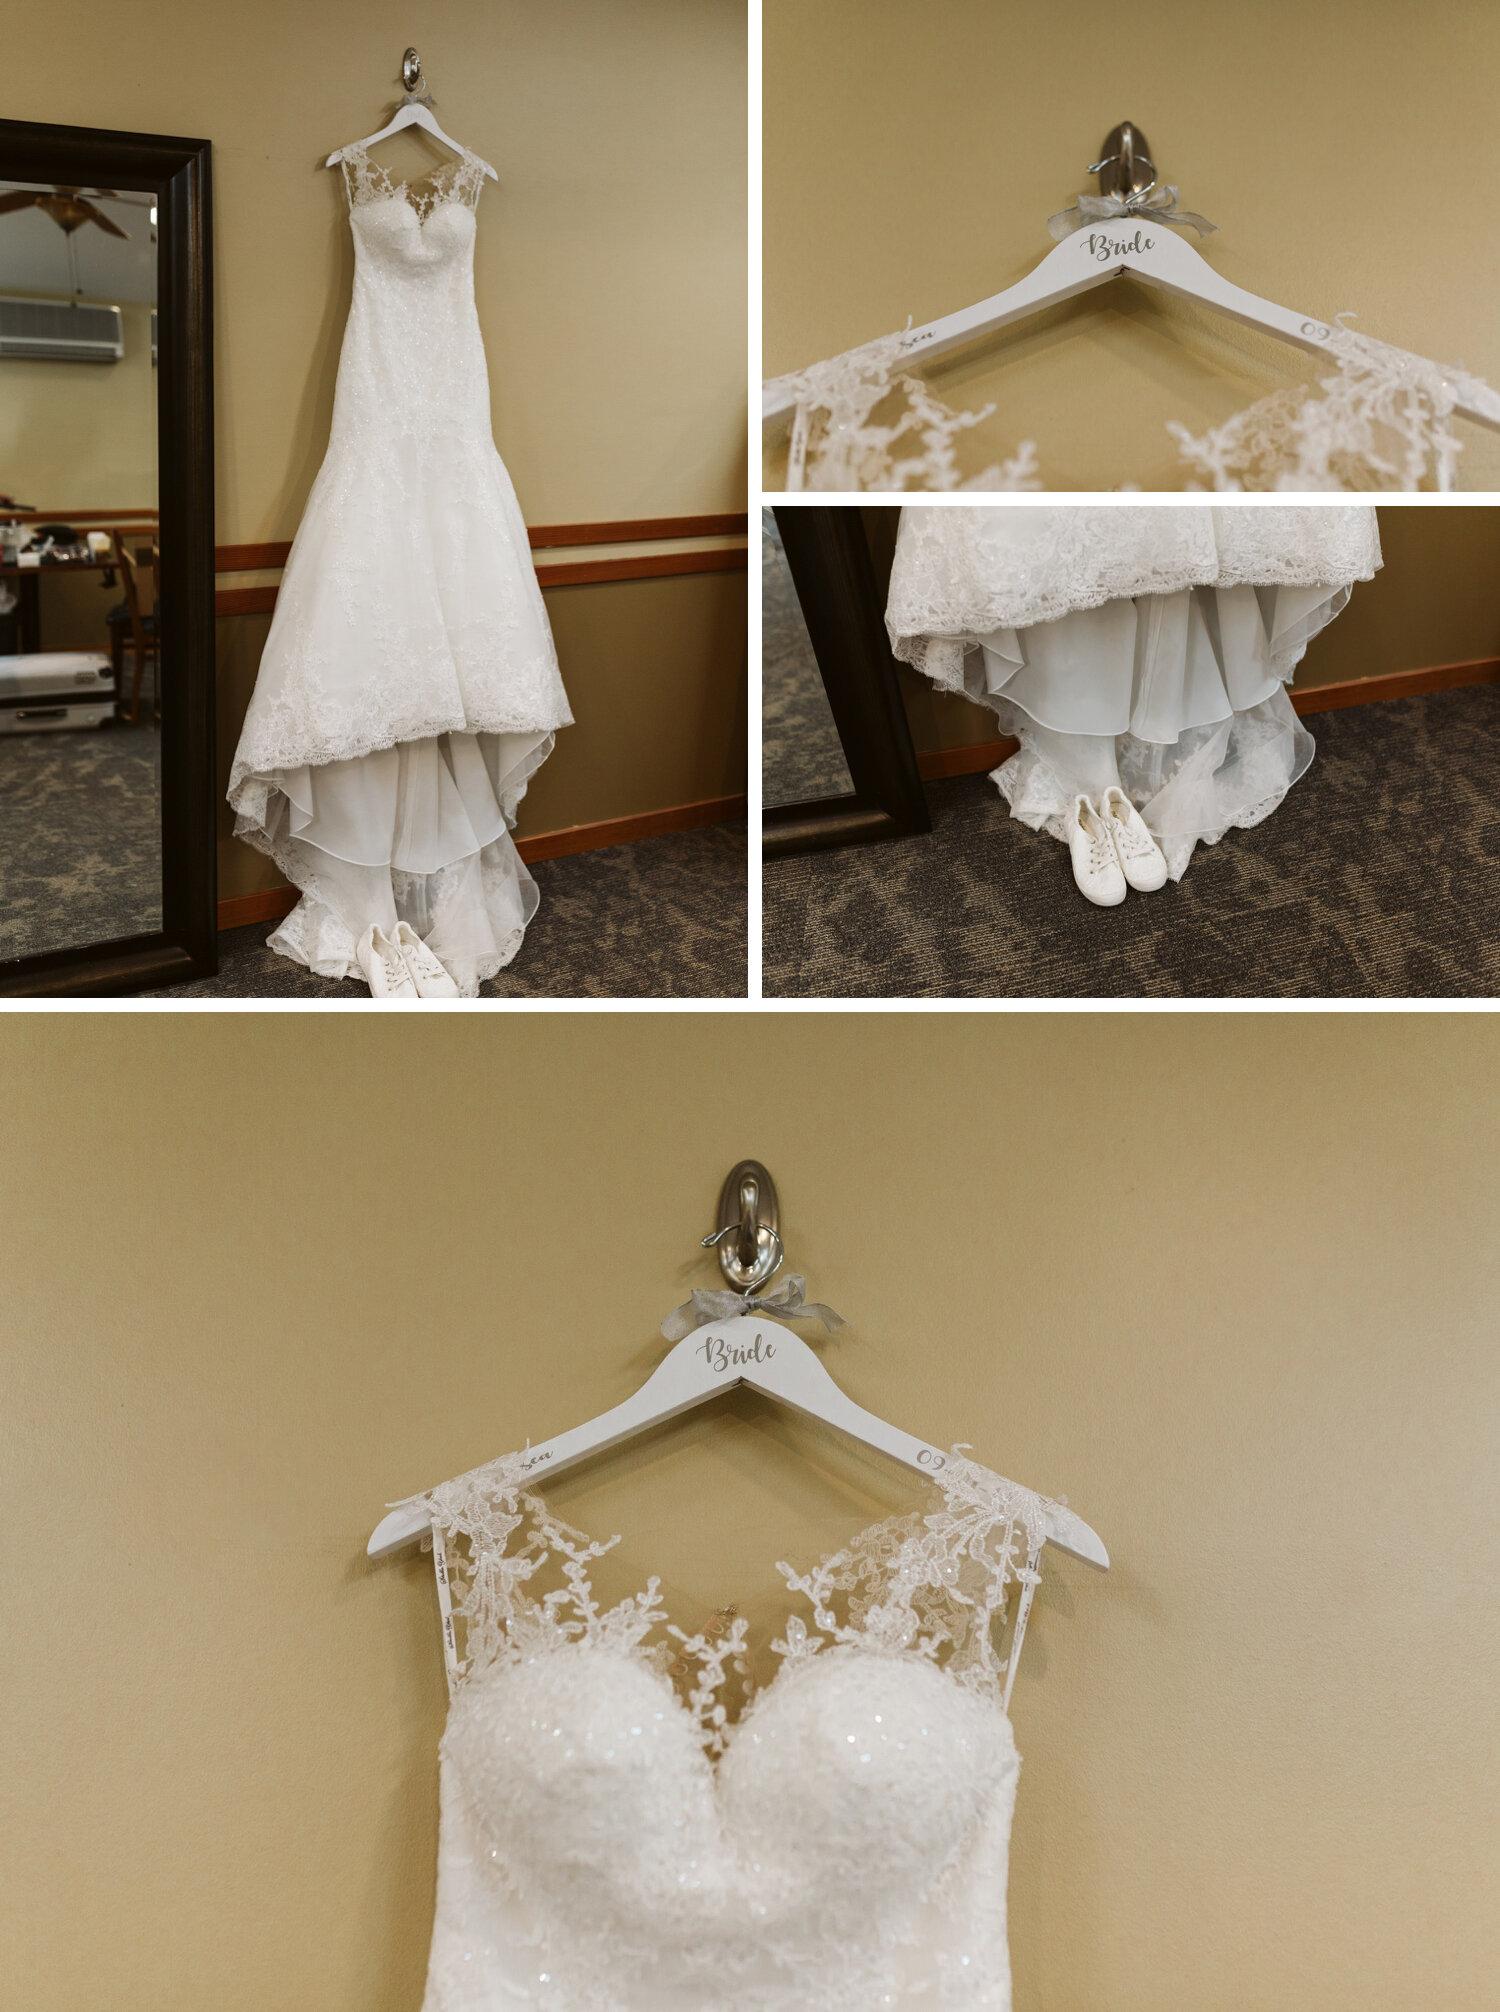 Wedding day preparation